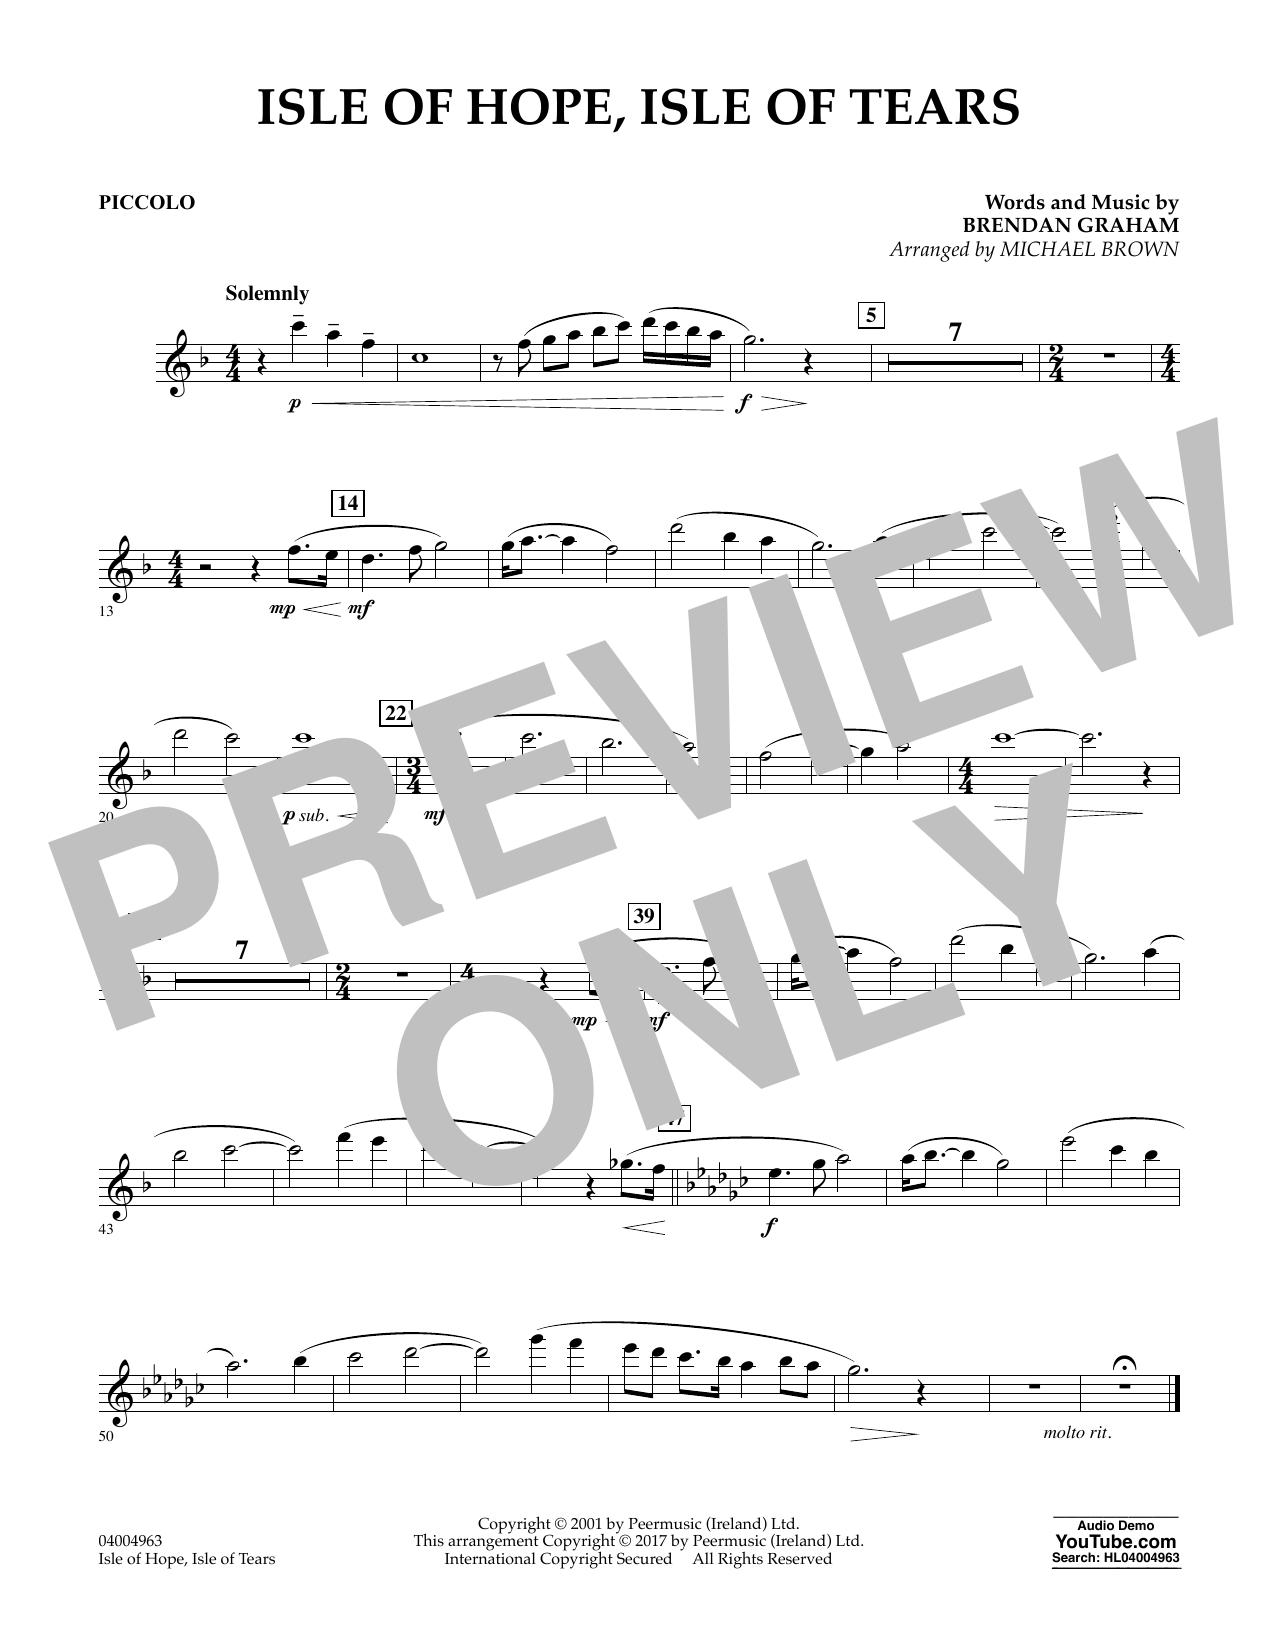 Isle of Hope, Isle of Tears - Piccolo Sheet Music